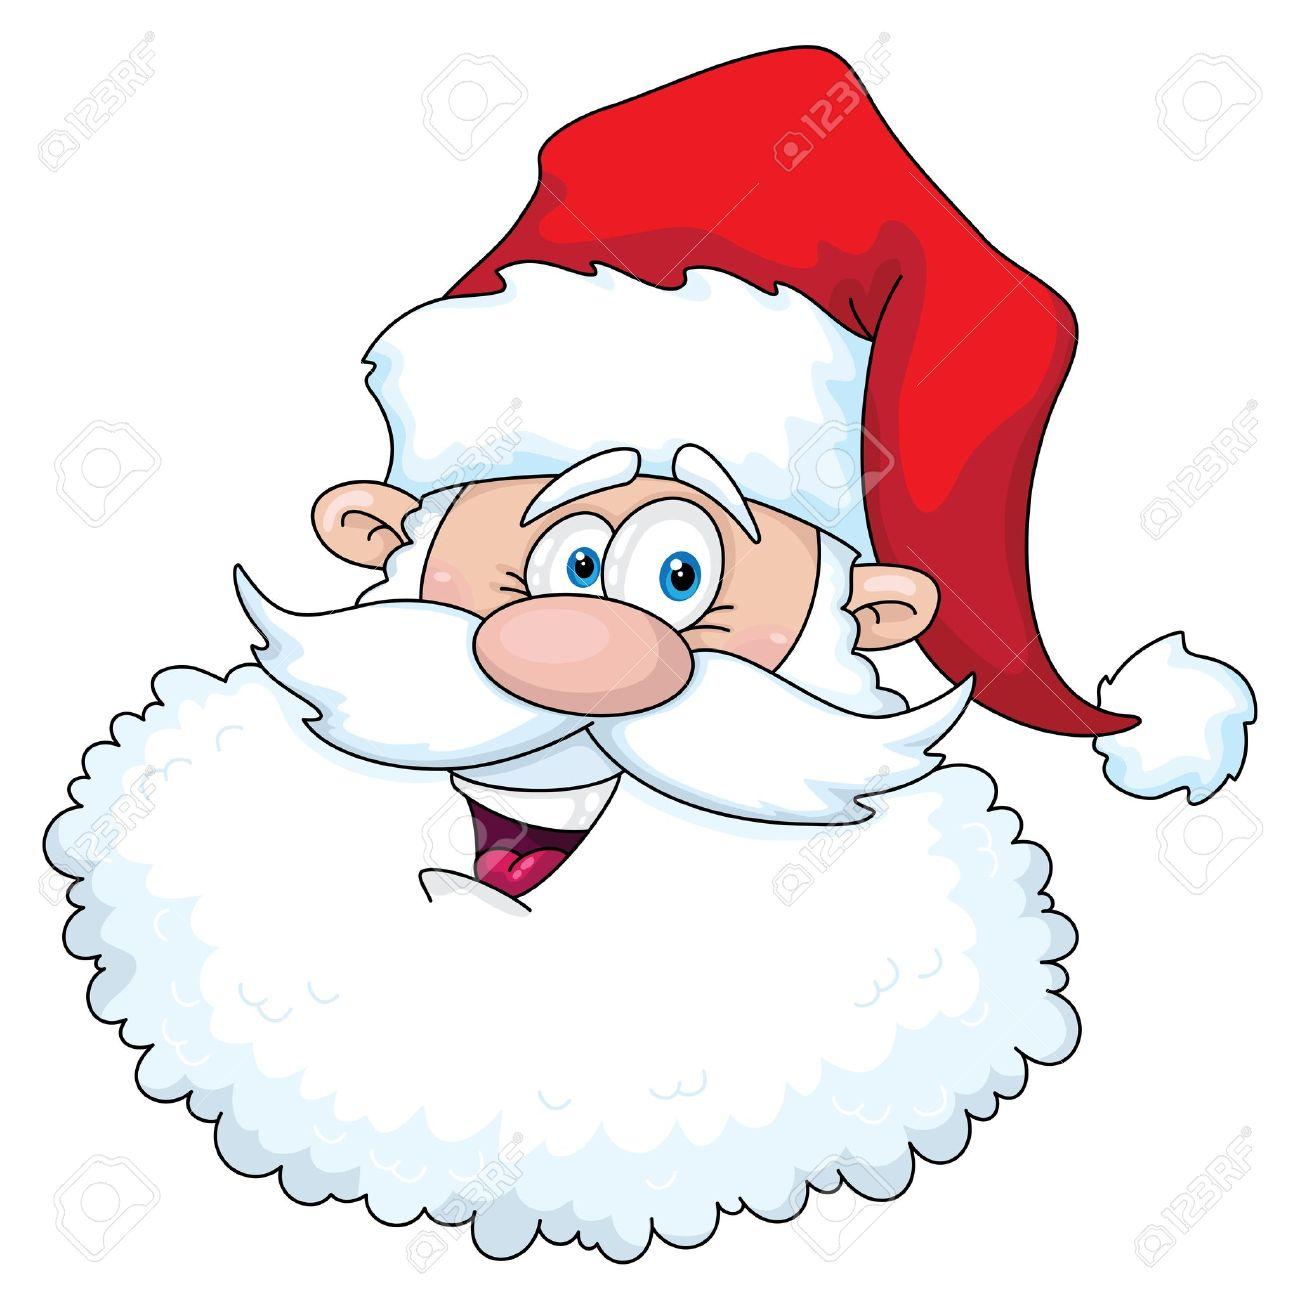 Funny Santa Claus Png & Free Funny Santa Claus.png Transparent Images  #113140 - PNGio